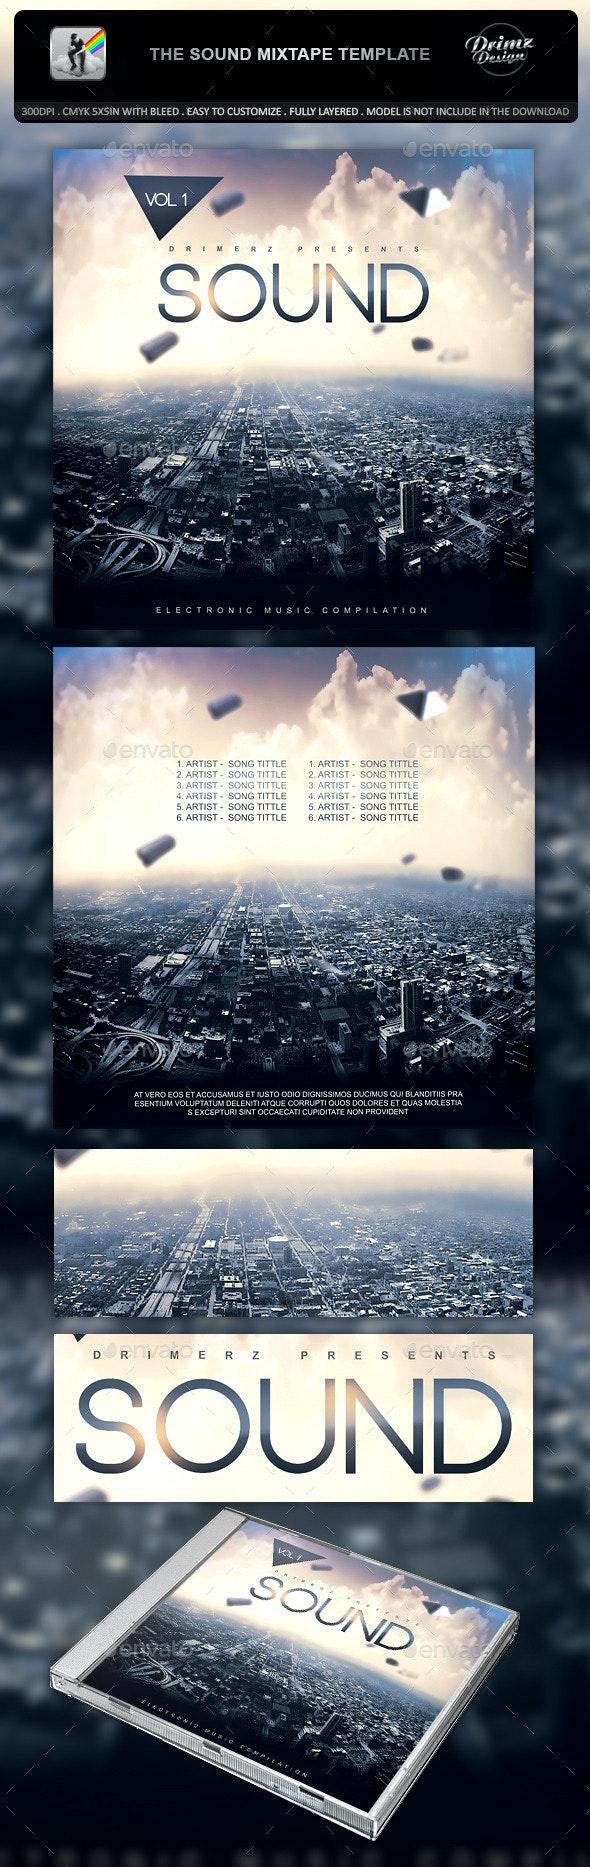 The Sound Mixtape Template - CD & DVD Artwork Print Templates